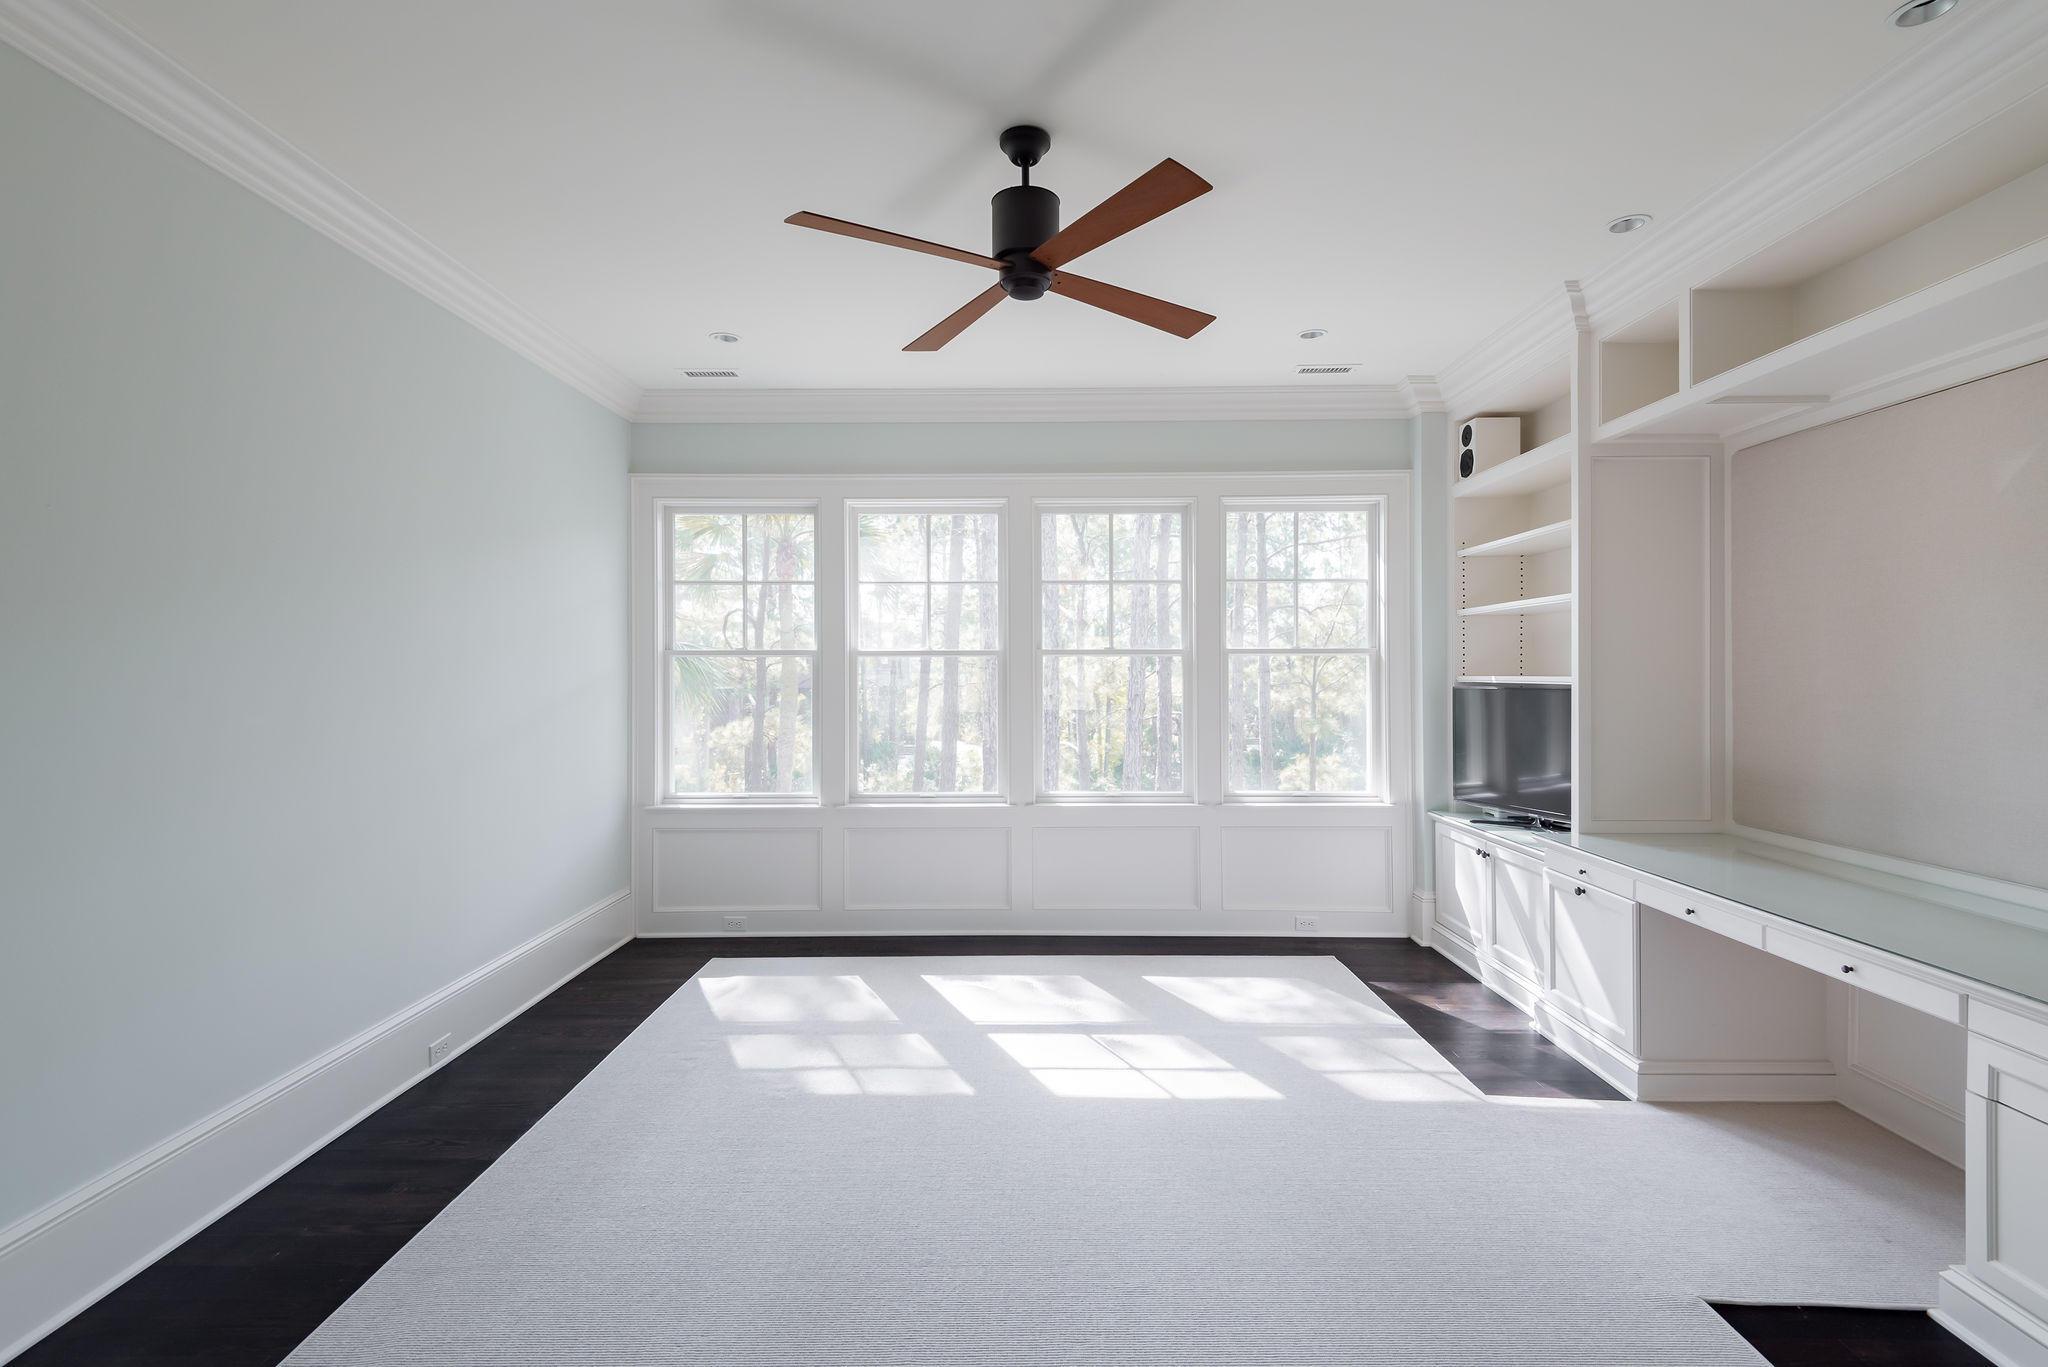 Kiawah Island Homes For Sale - 3 Grey Widgeon, Kiawah Island, SC - 31